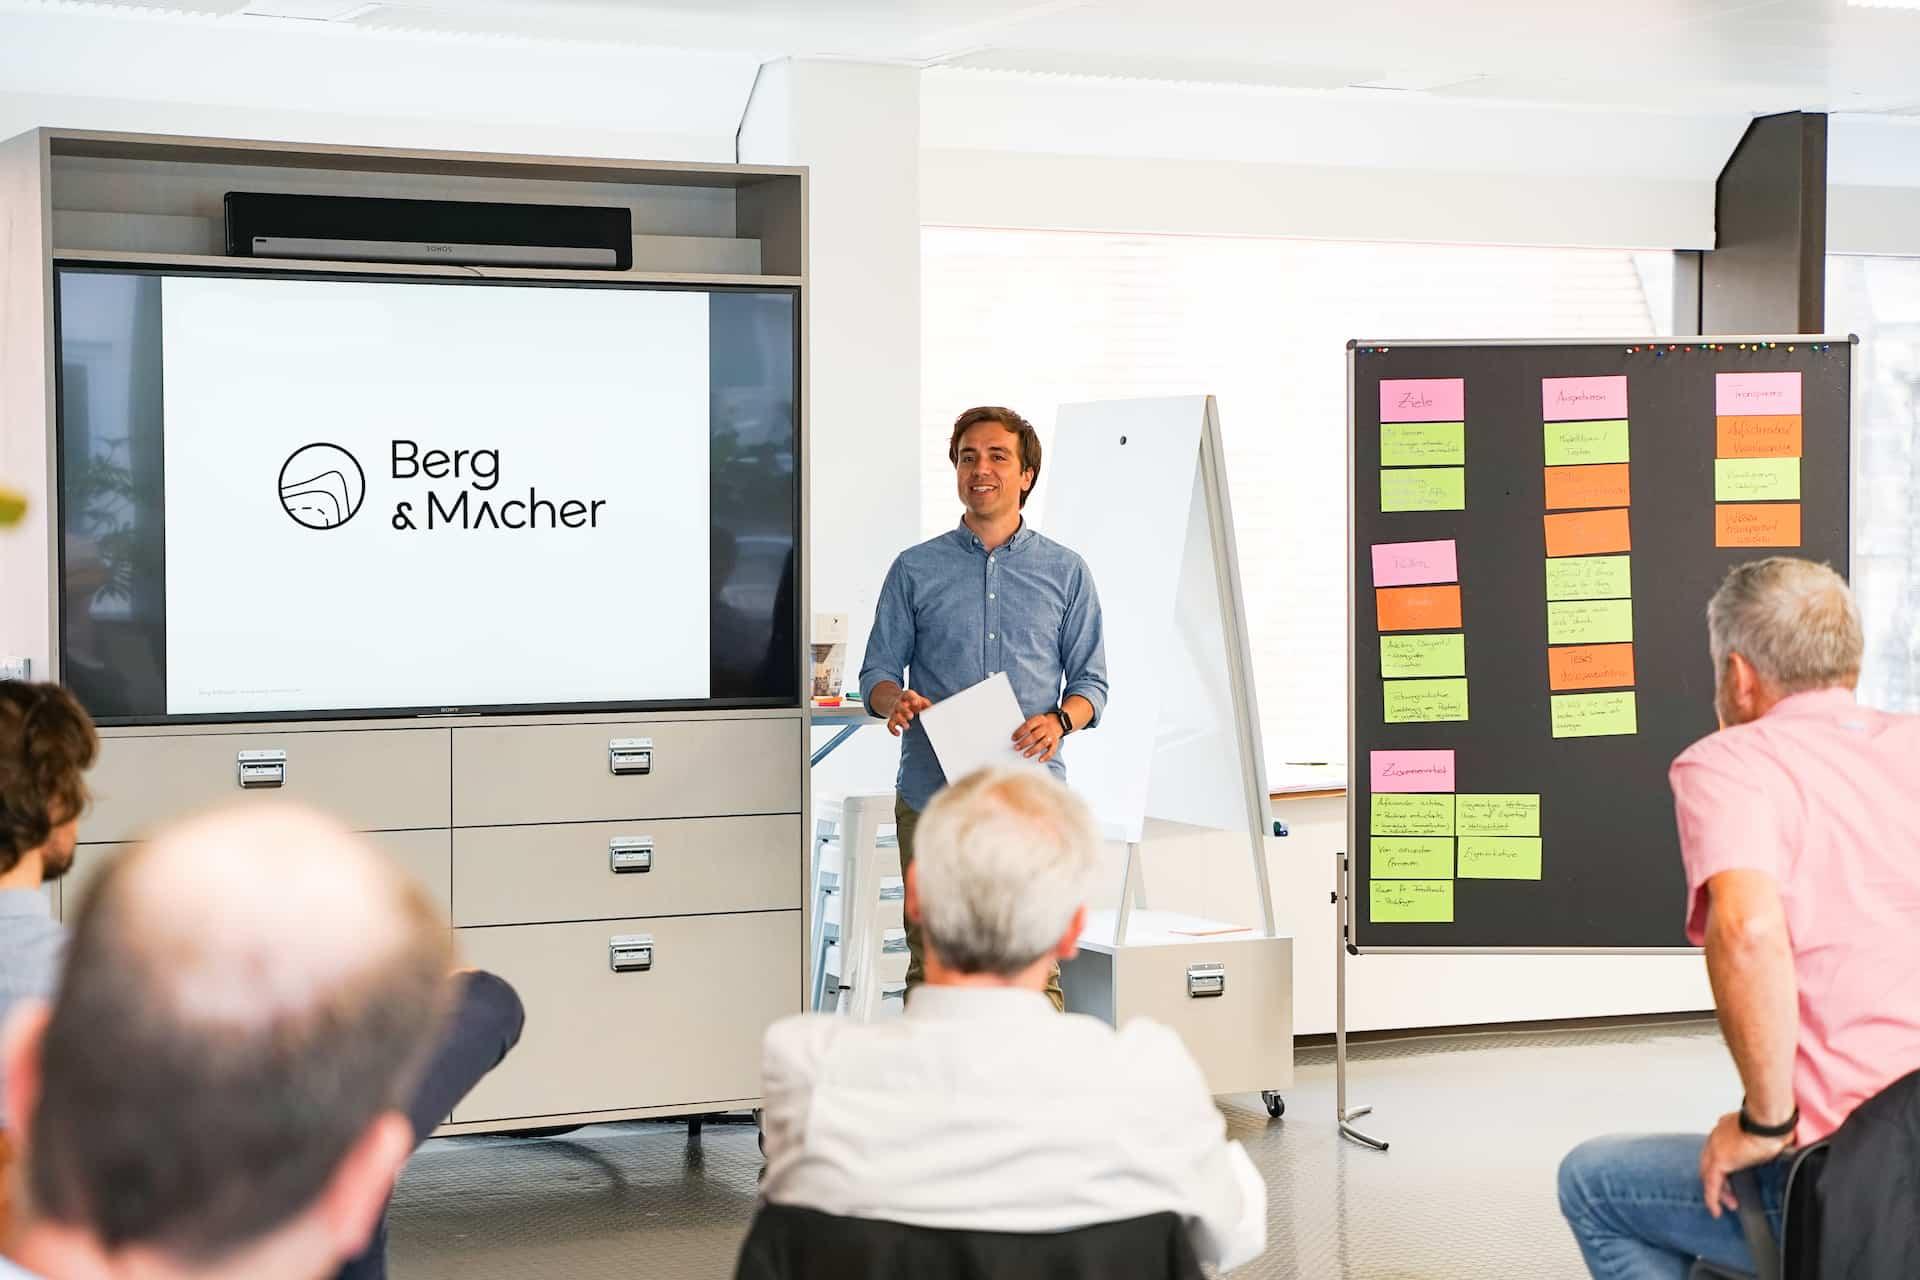 Berg & Macher Organisationsberatung Offsite